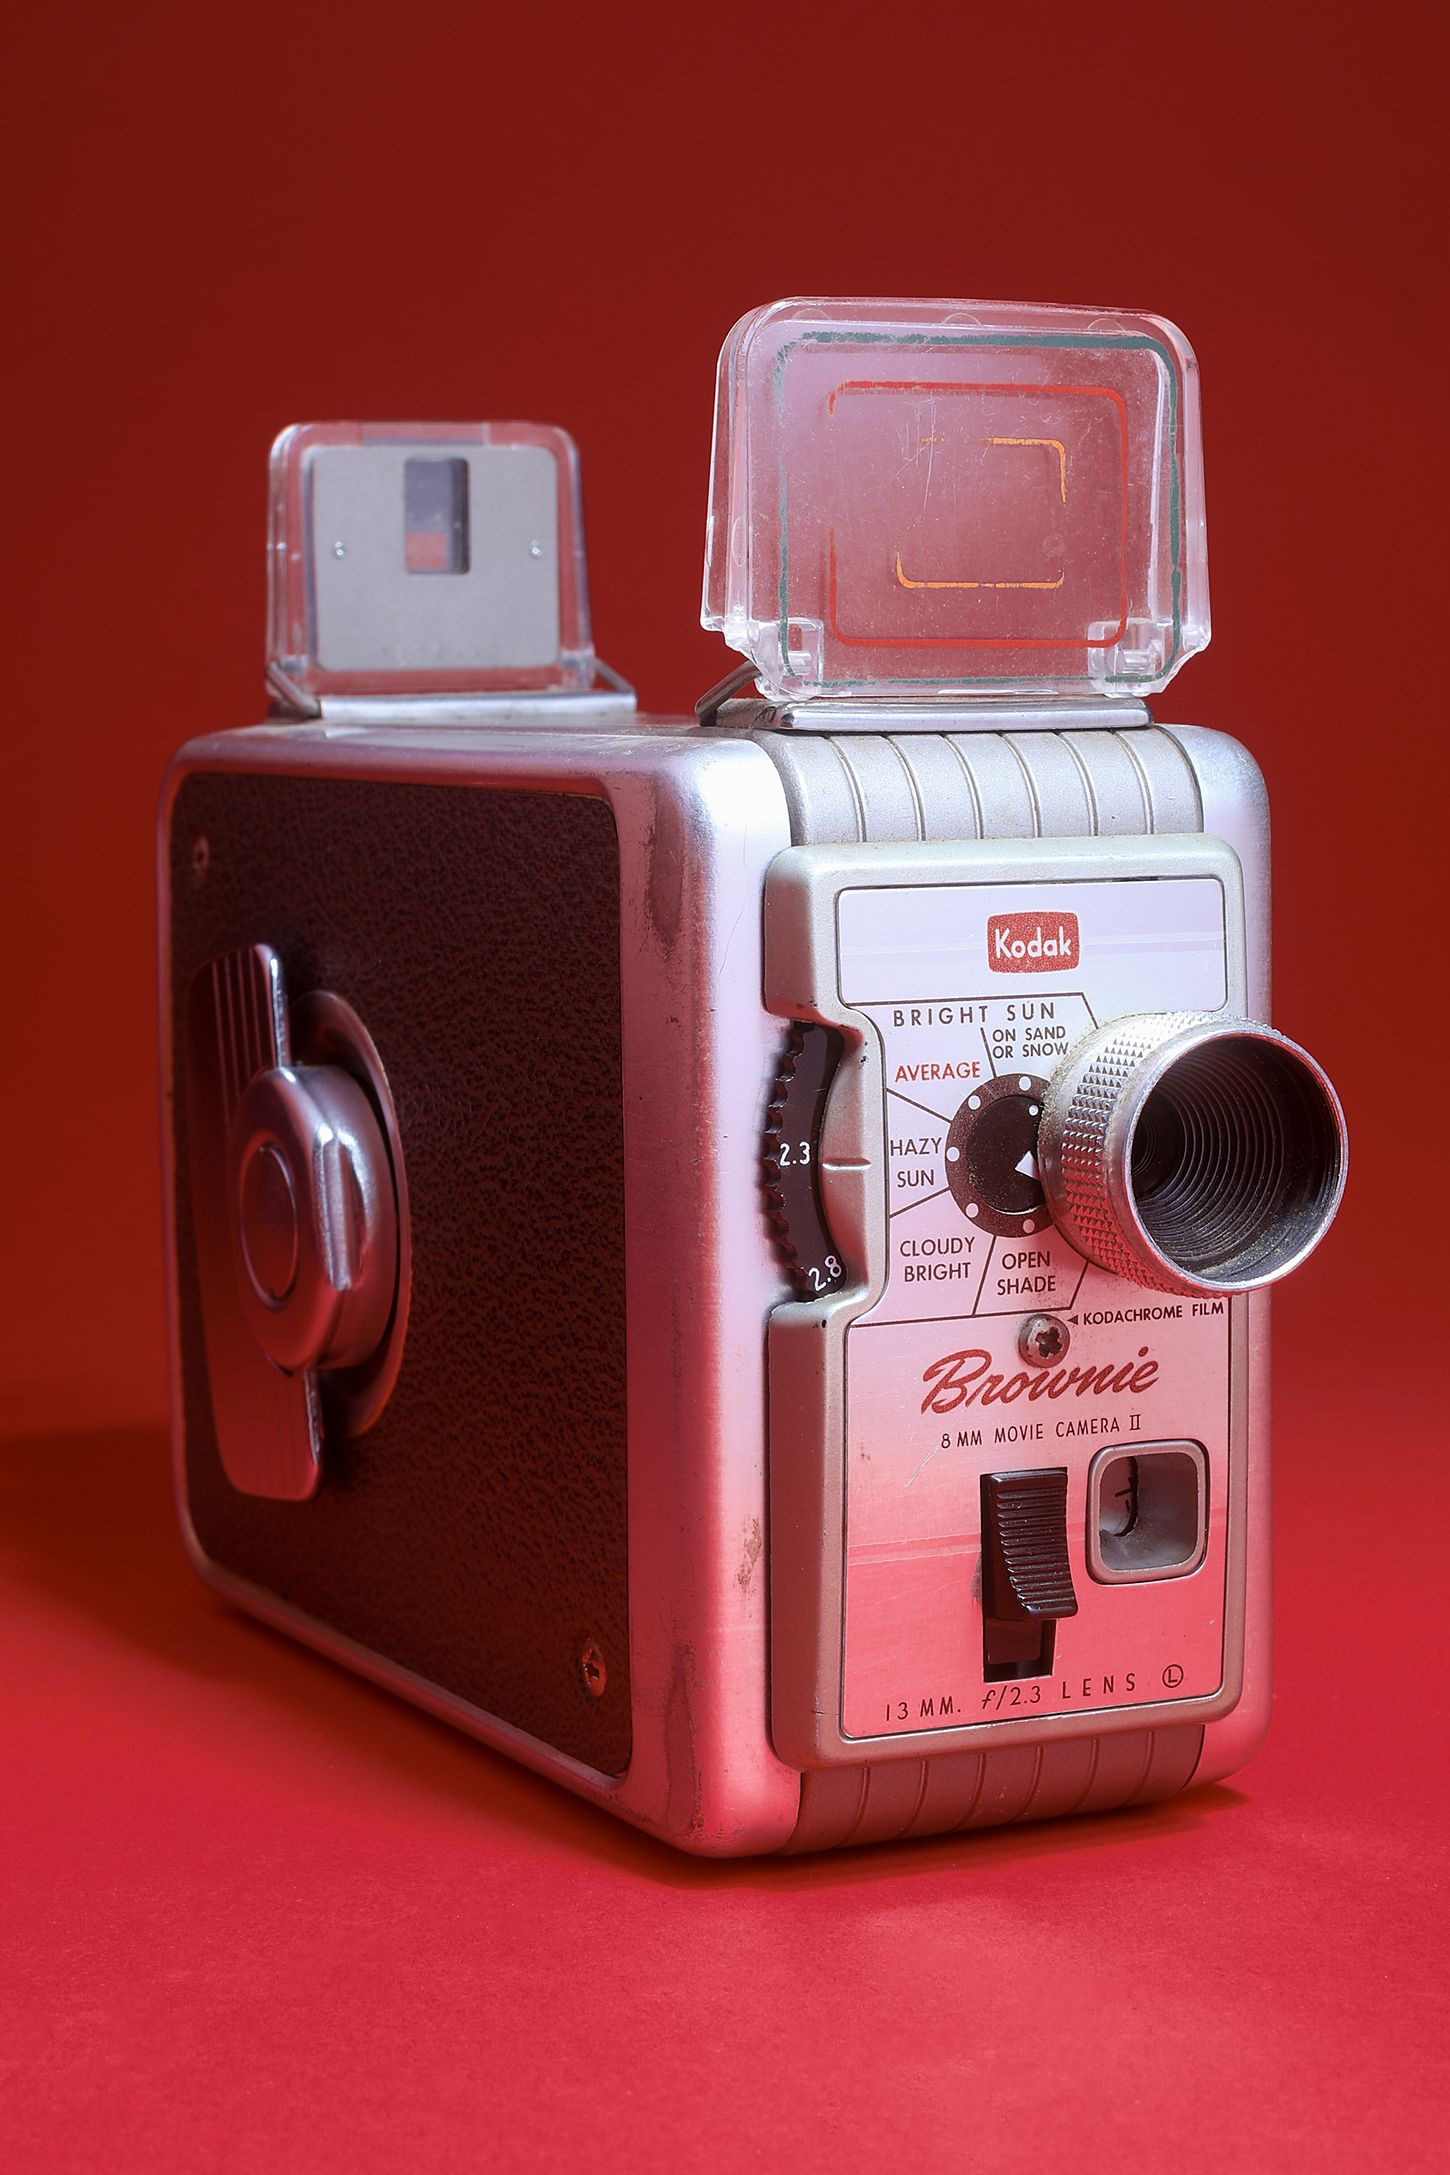 8Mm Vintage Camera acme camera co. vintage kodak brownie 8mm movie camera